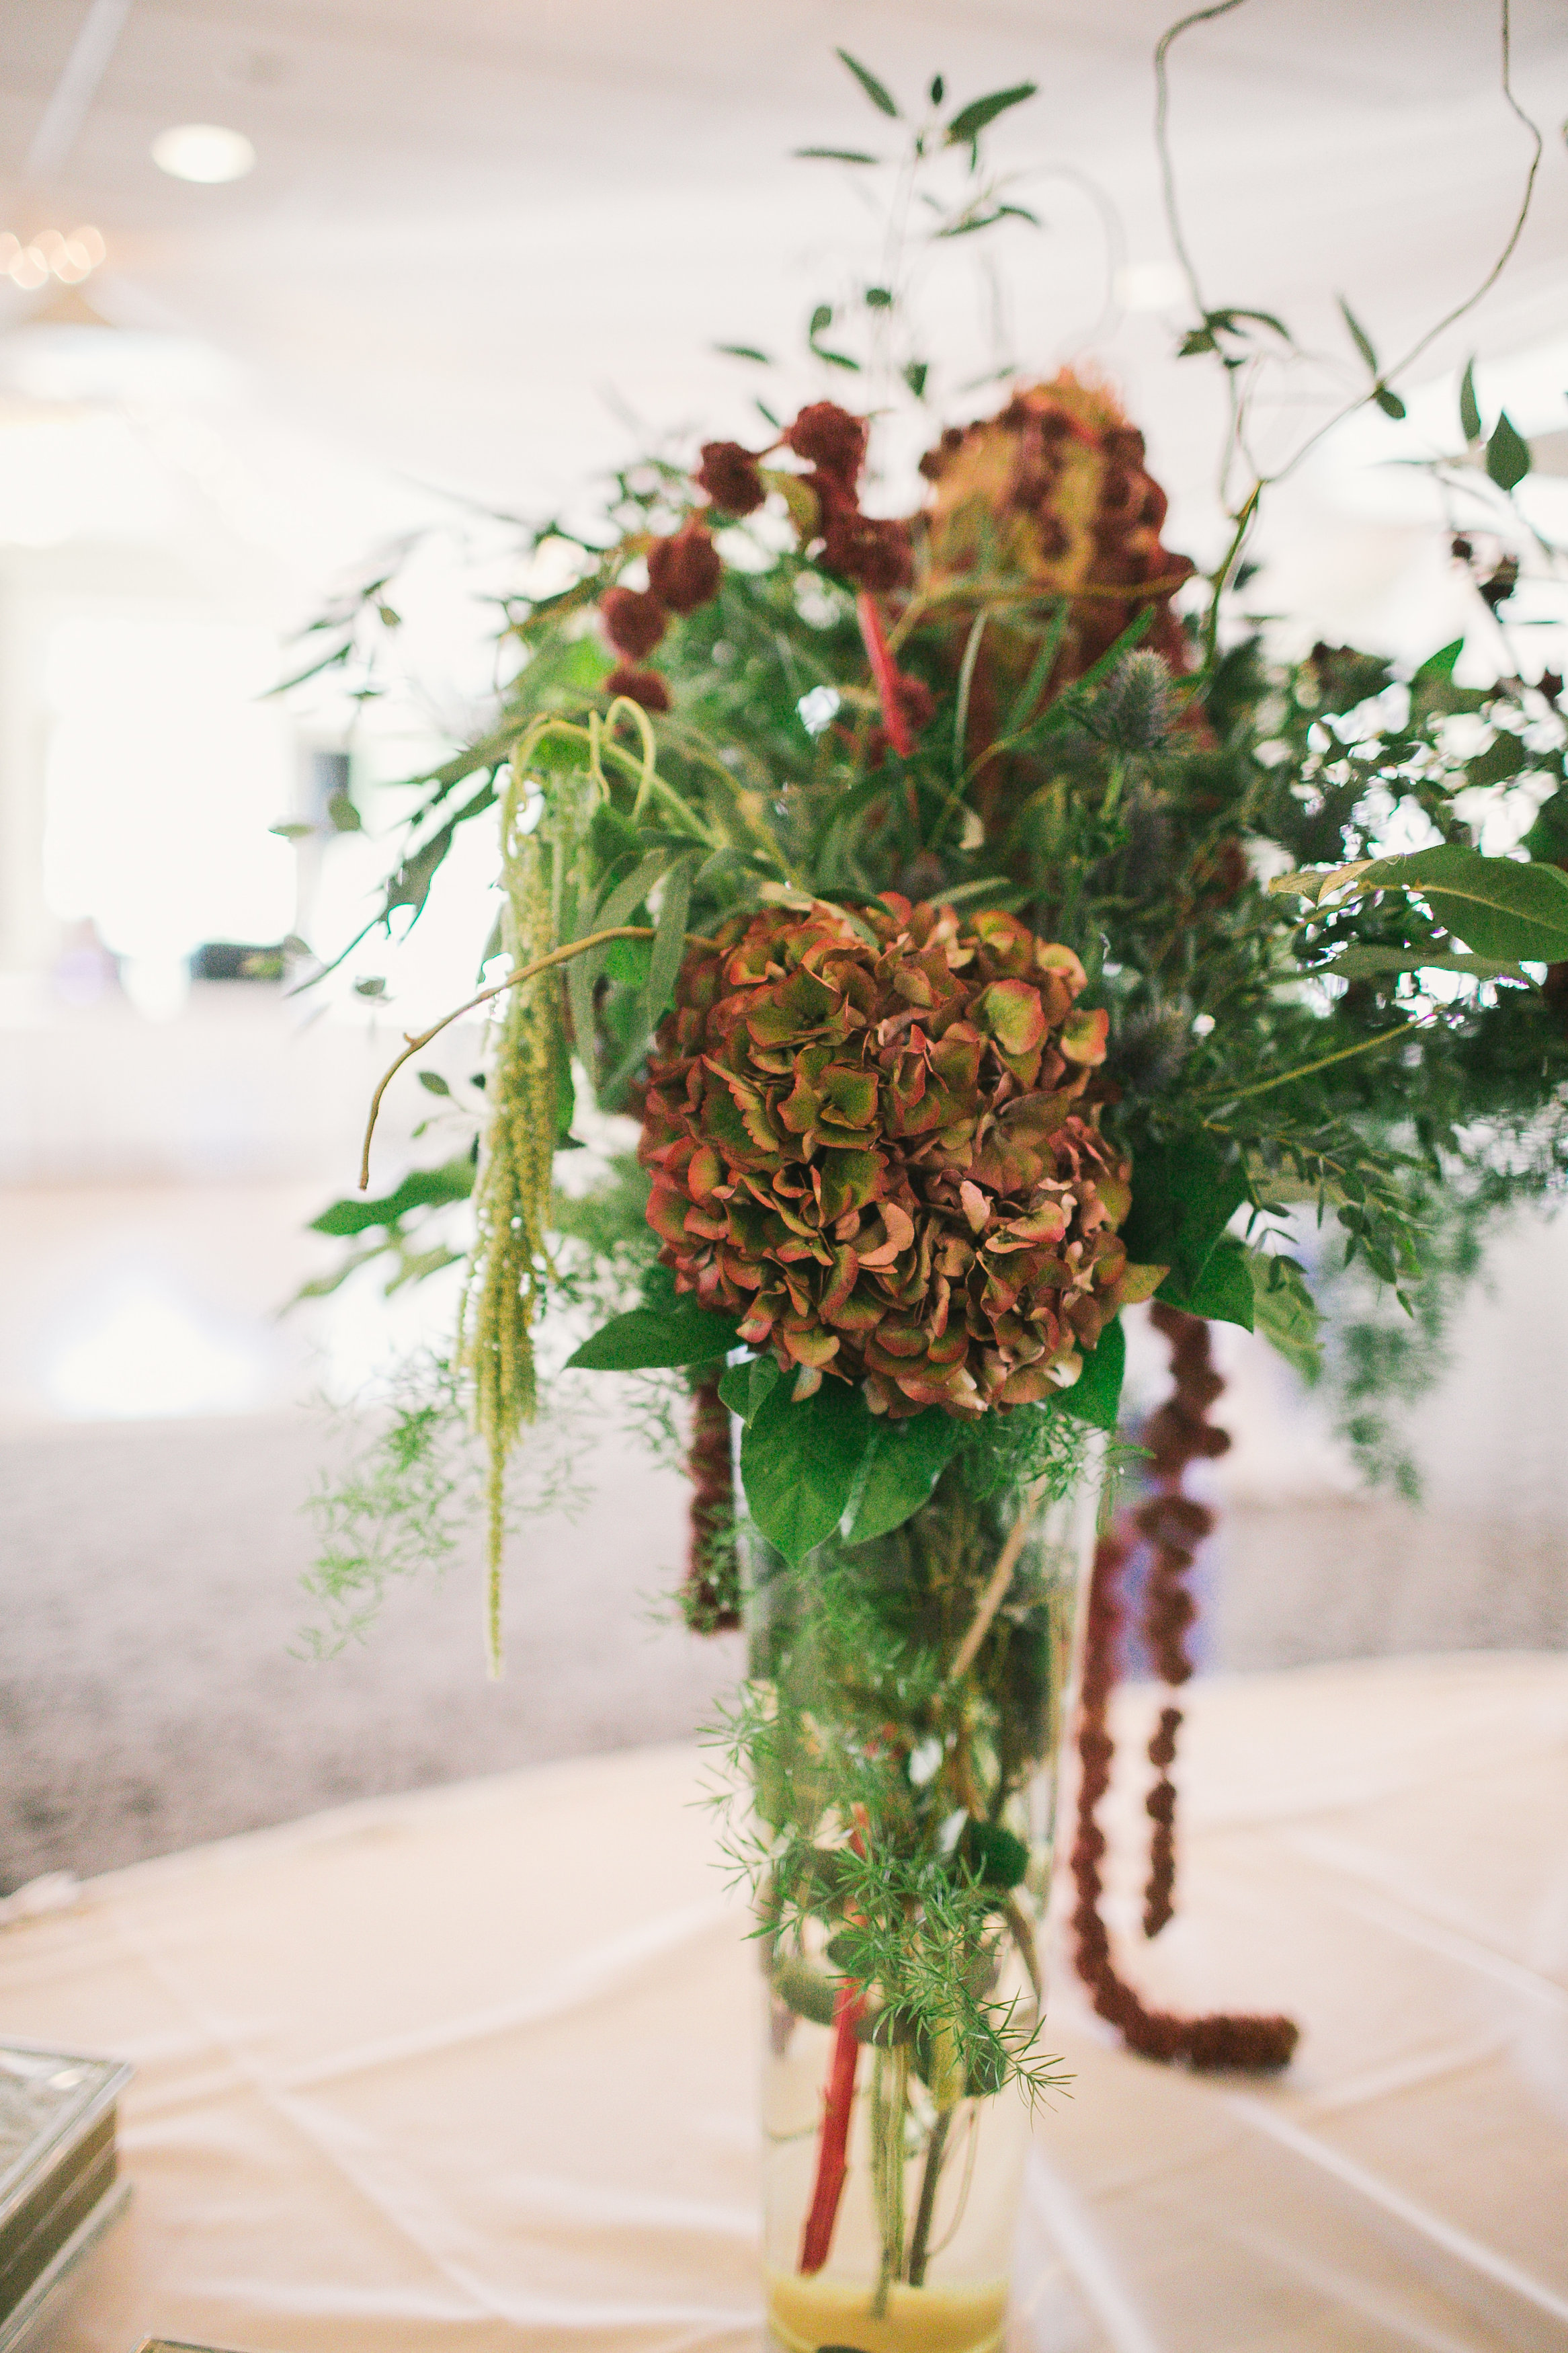 kim-nate-wedding-502 - Copy.jpg